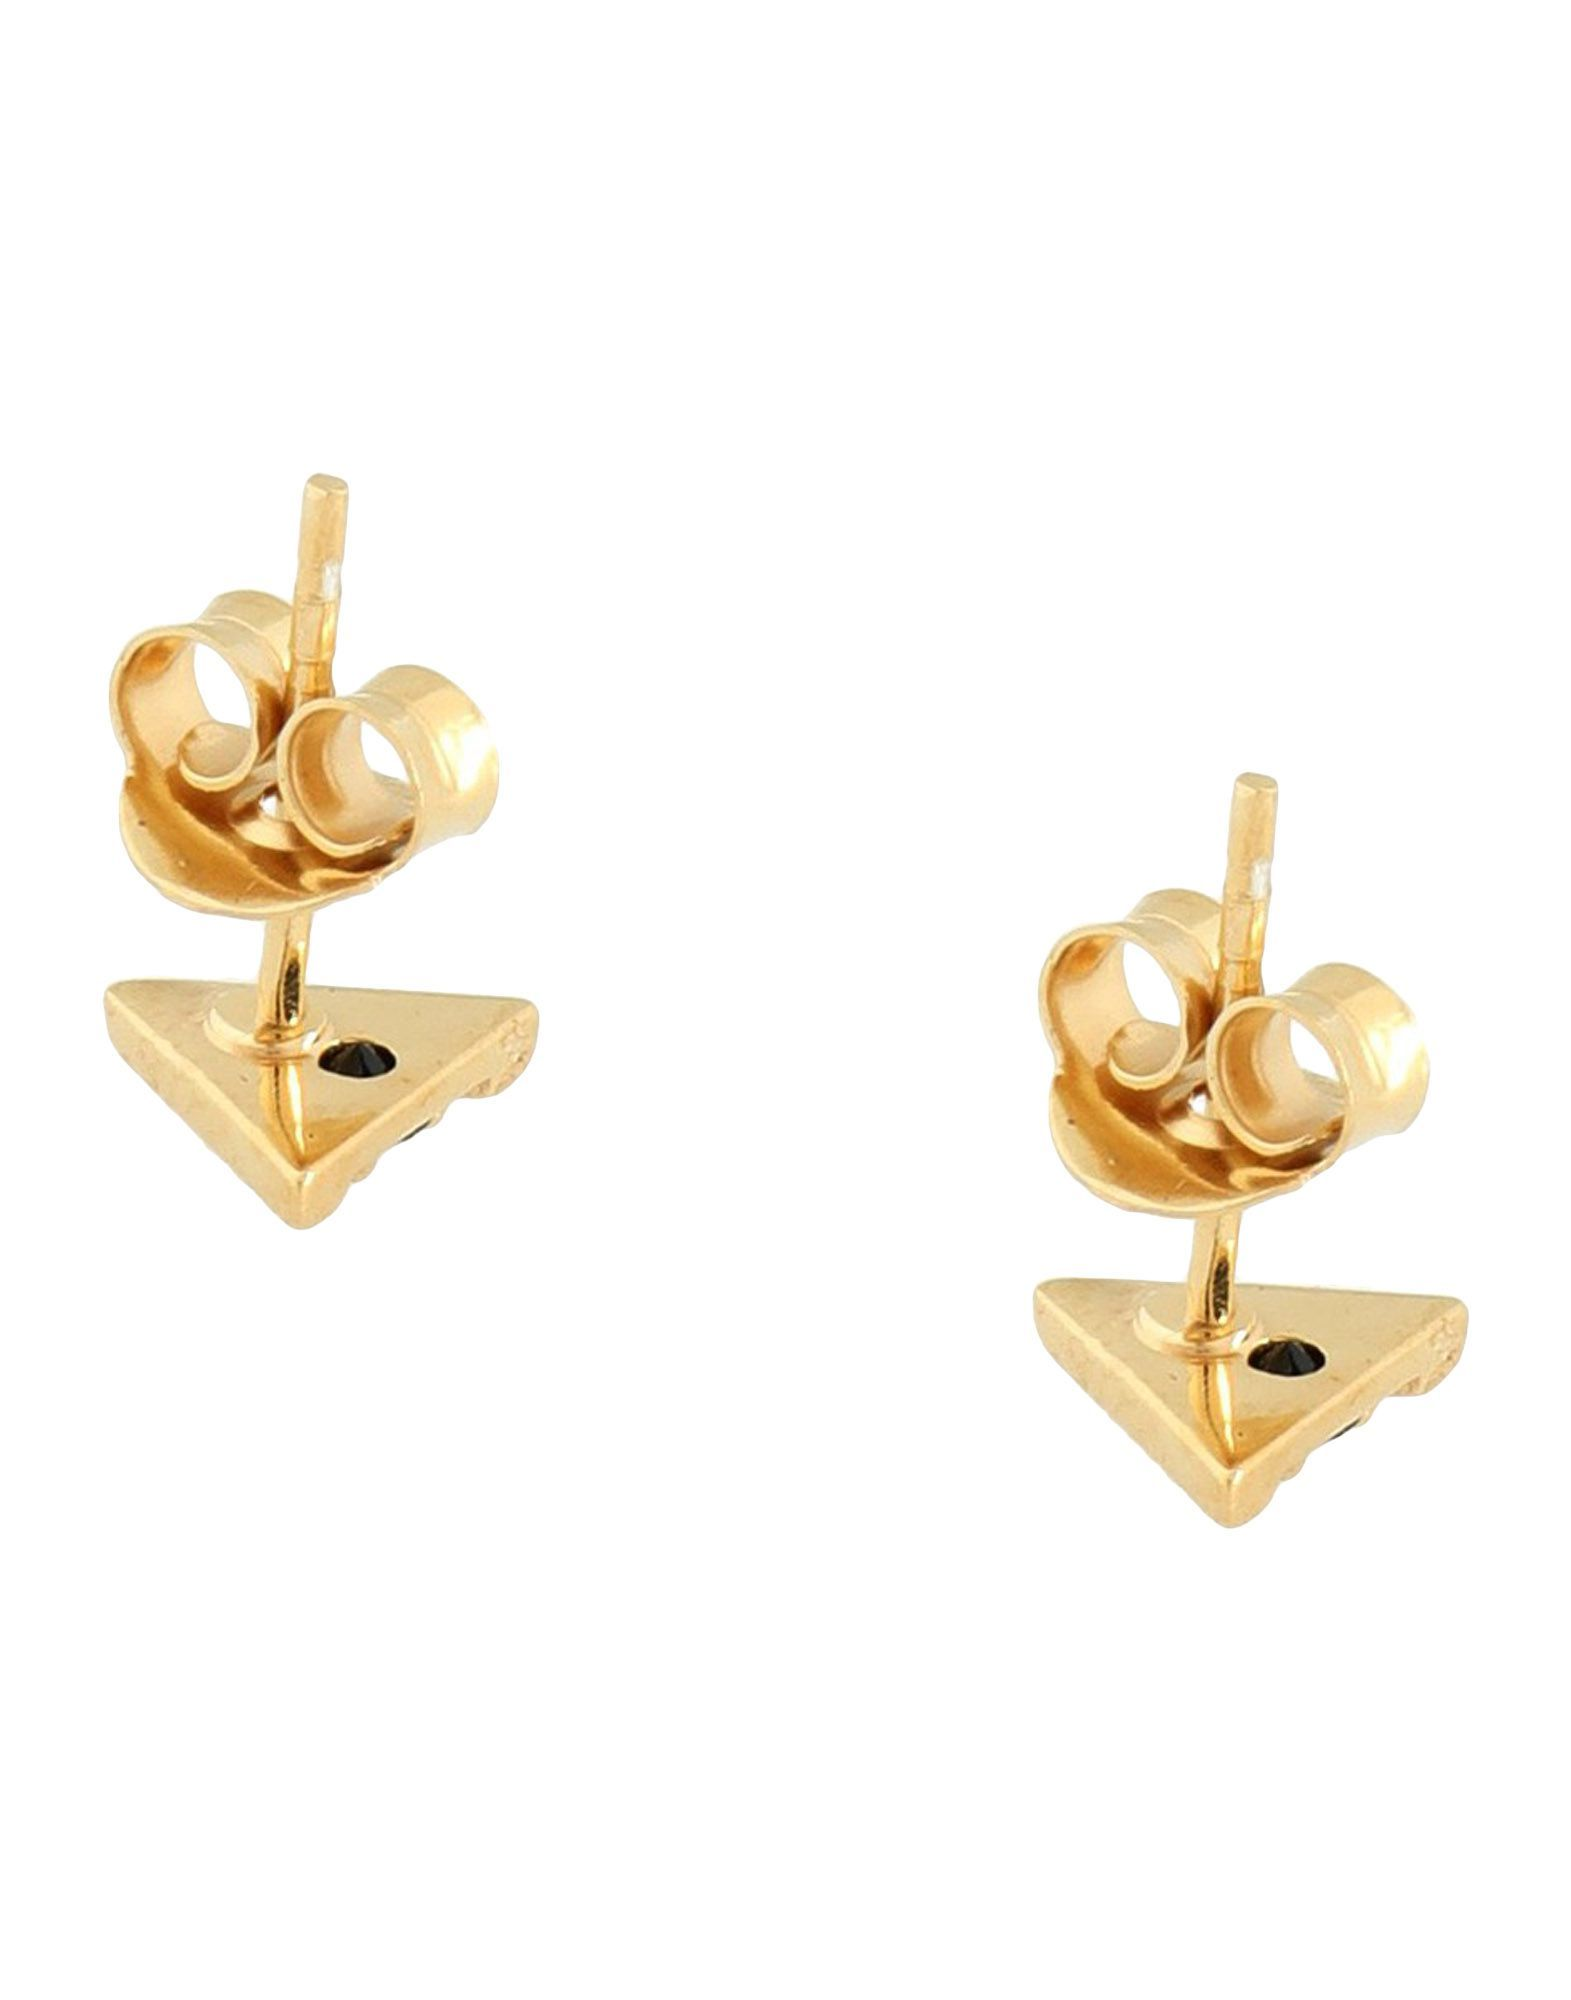 Zoe & Morgan Gold Plated 925/1000 Silver Stud Earrings